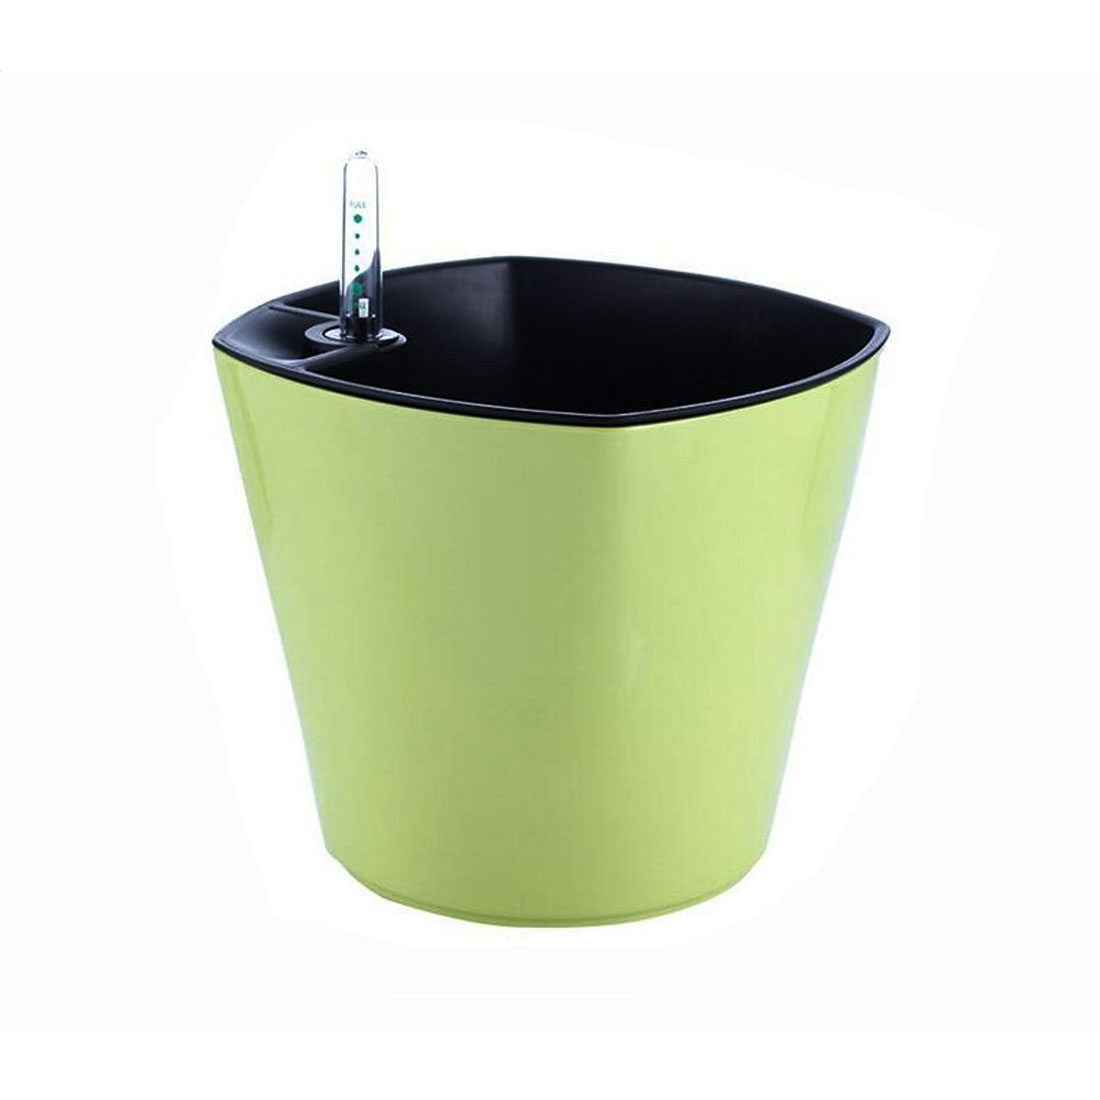 Home Plastic Self Watering Planter Flowerpot Light Green w Water Level Indicator